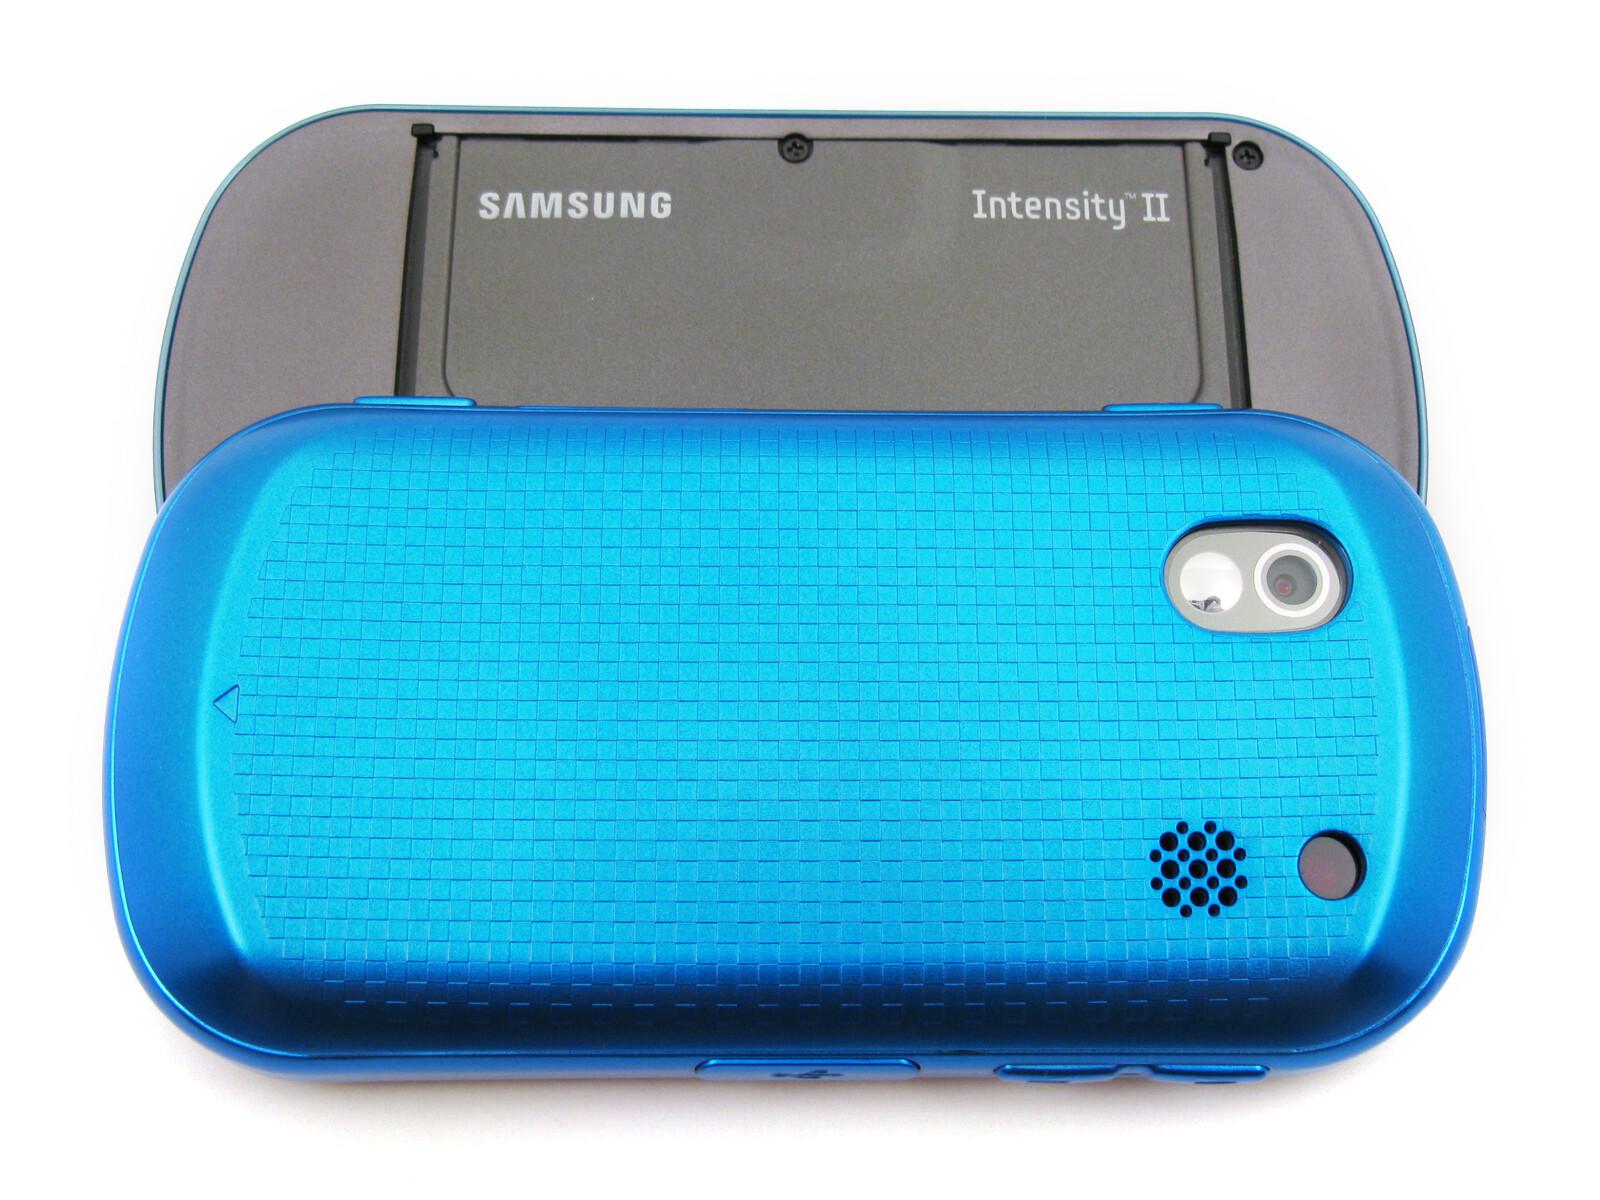 Samsung Intensity 2 Cases Samsung intensity ii